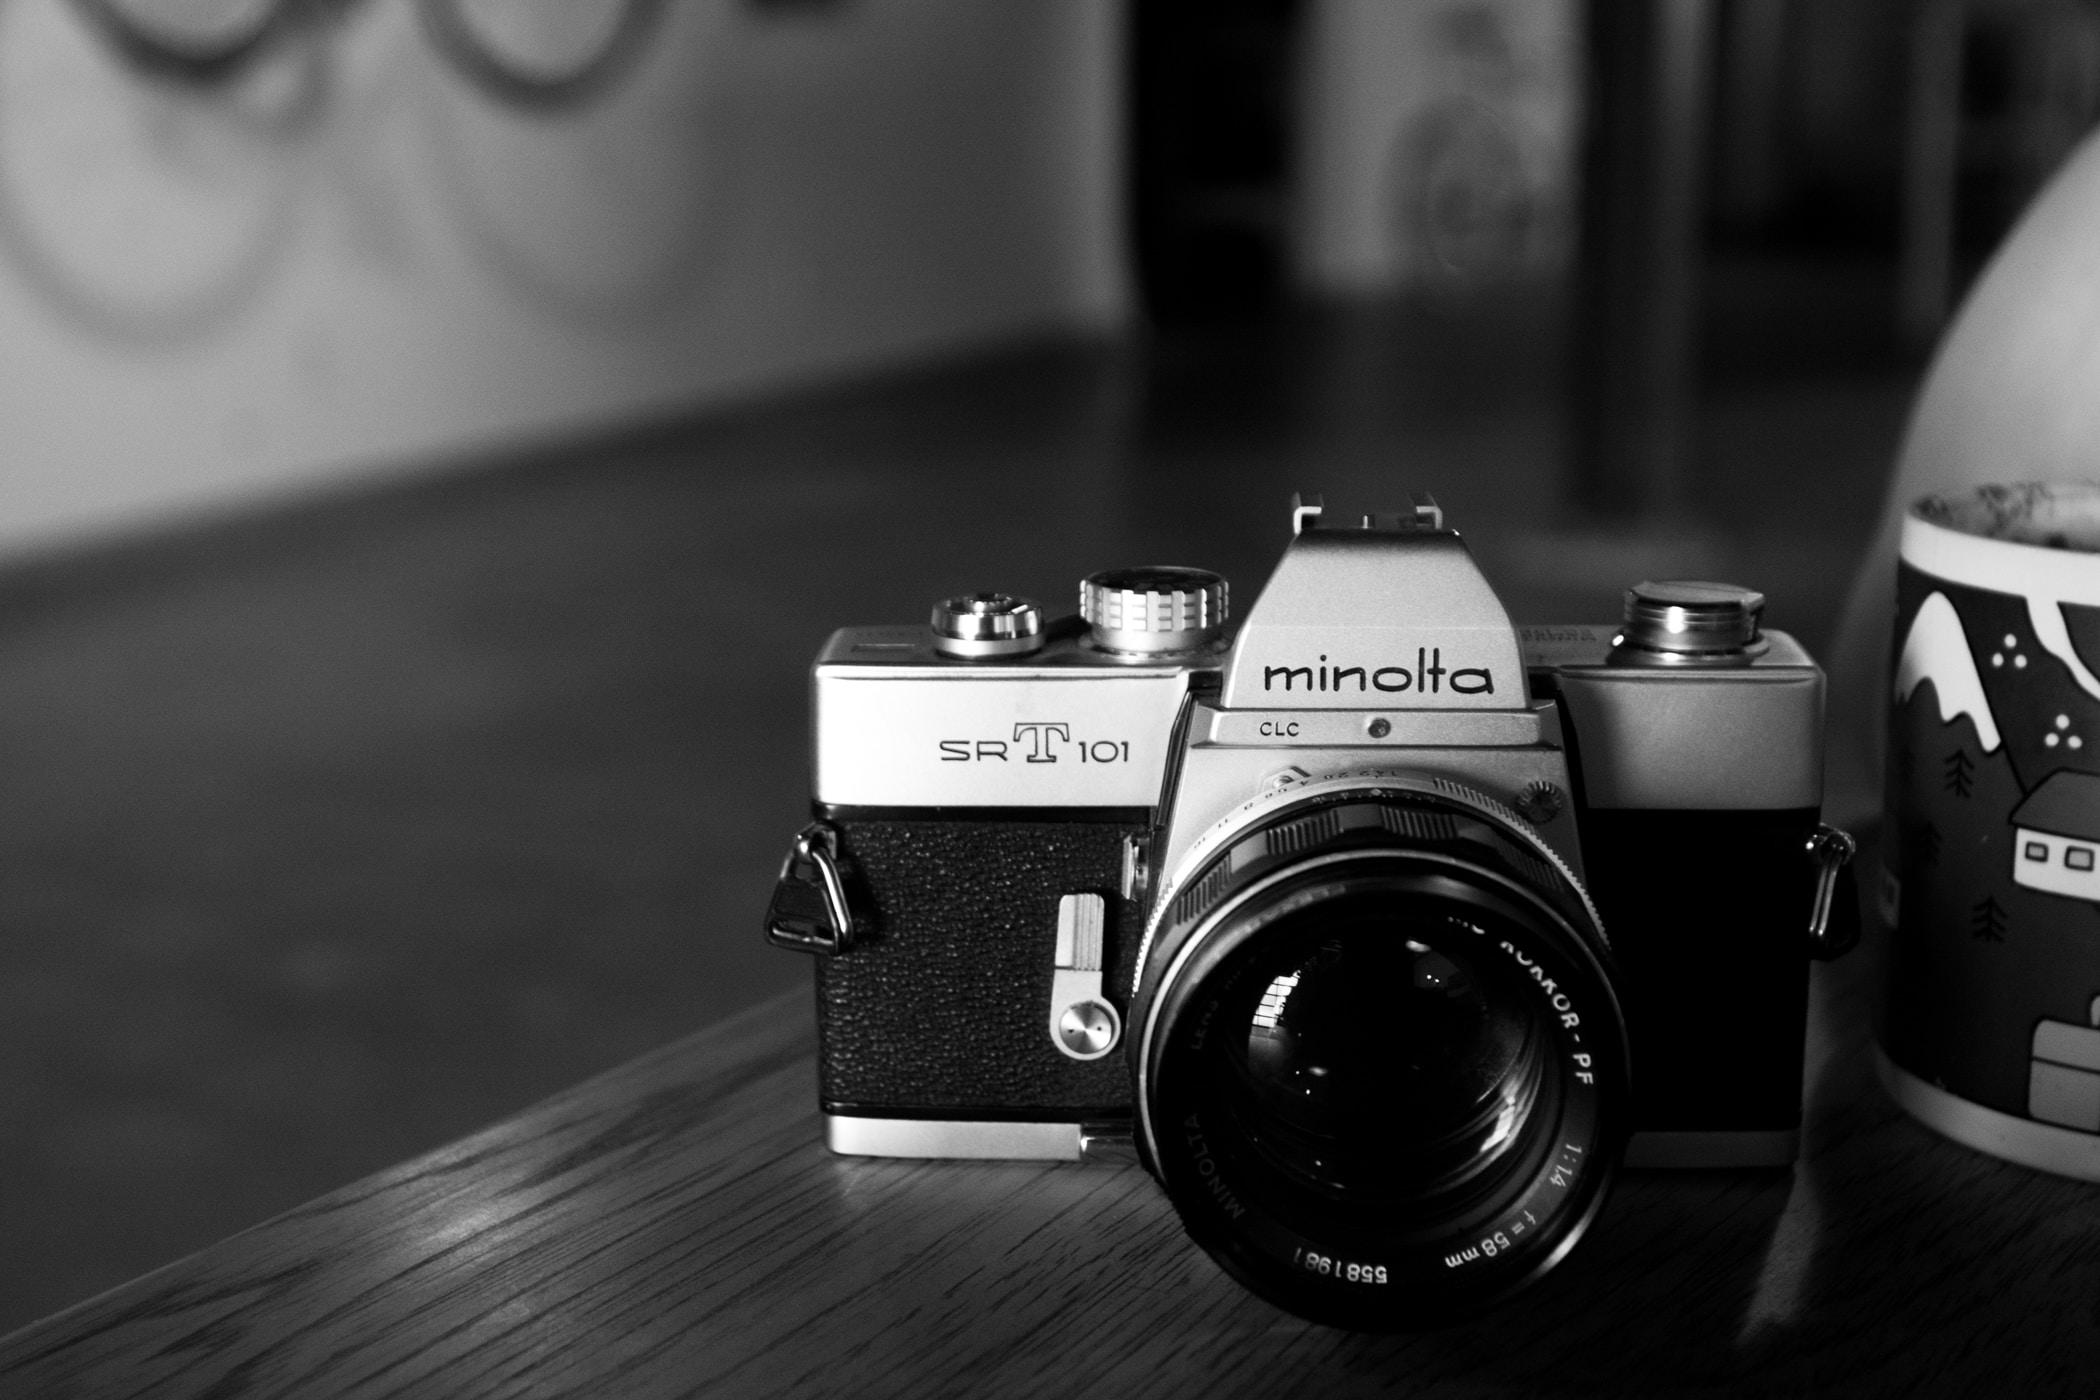 Minolta SLR camera on table